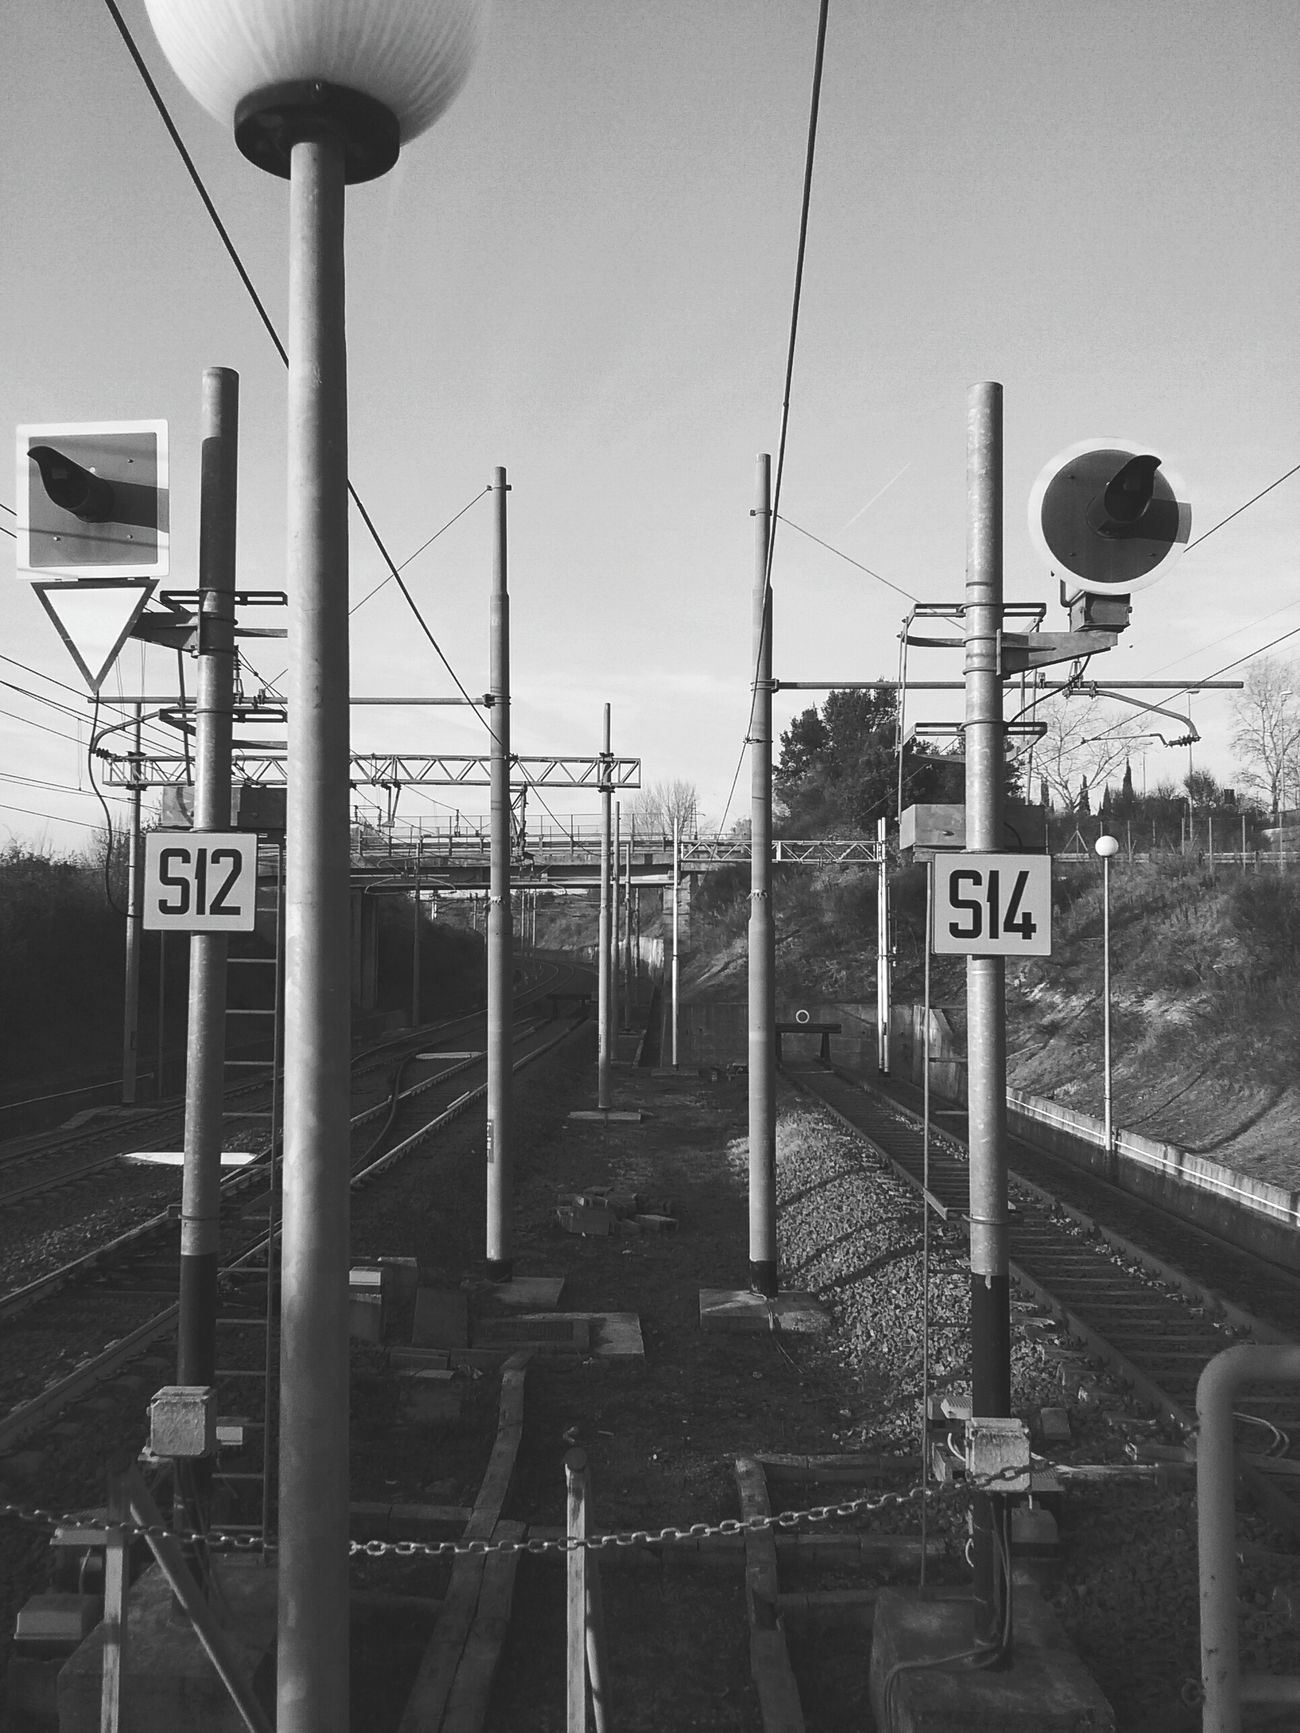 Station Montebello Grunge Urban Blackandwhite Photooftheday